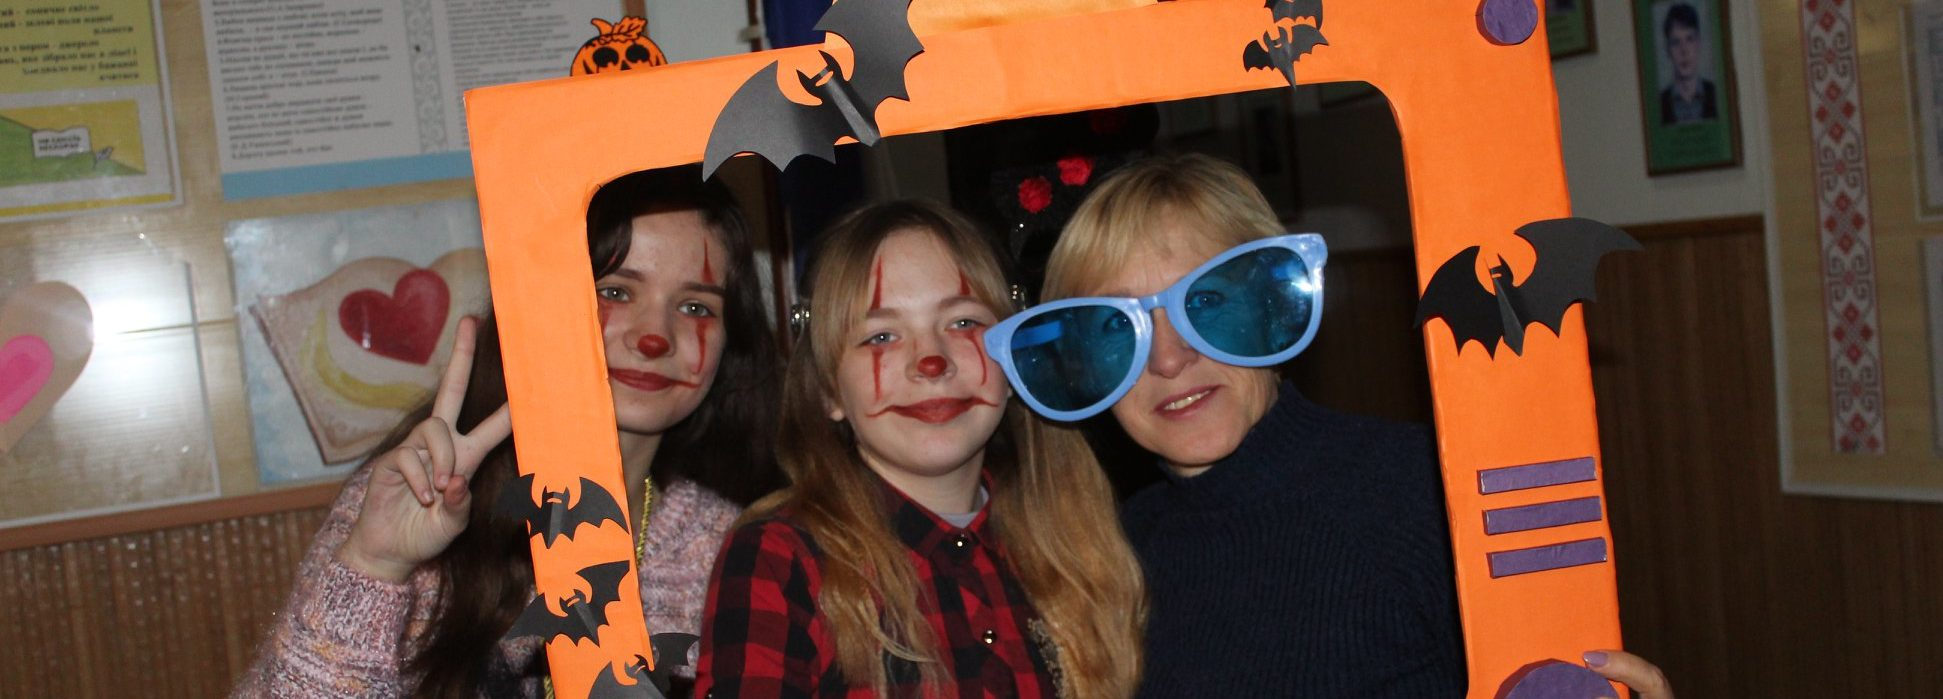 Spooky Halloween Party 2019